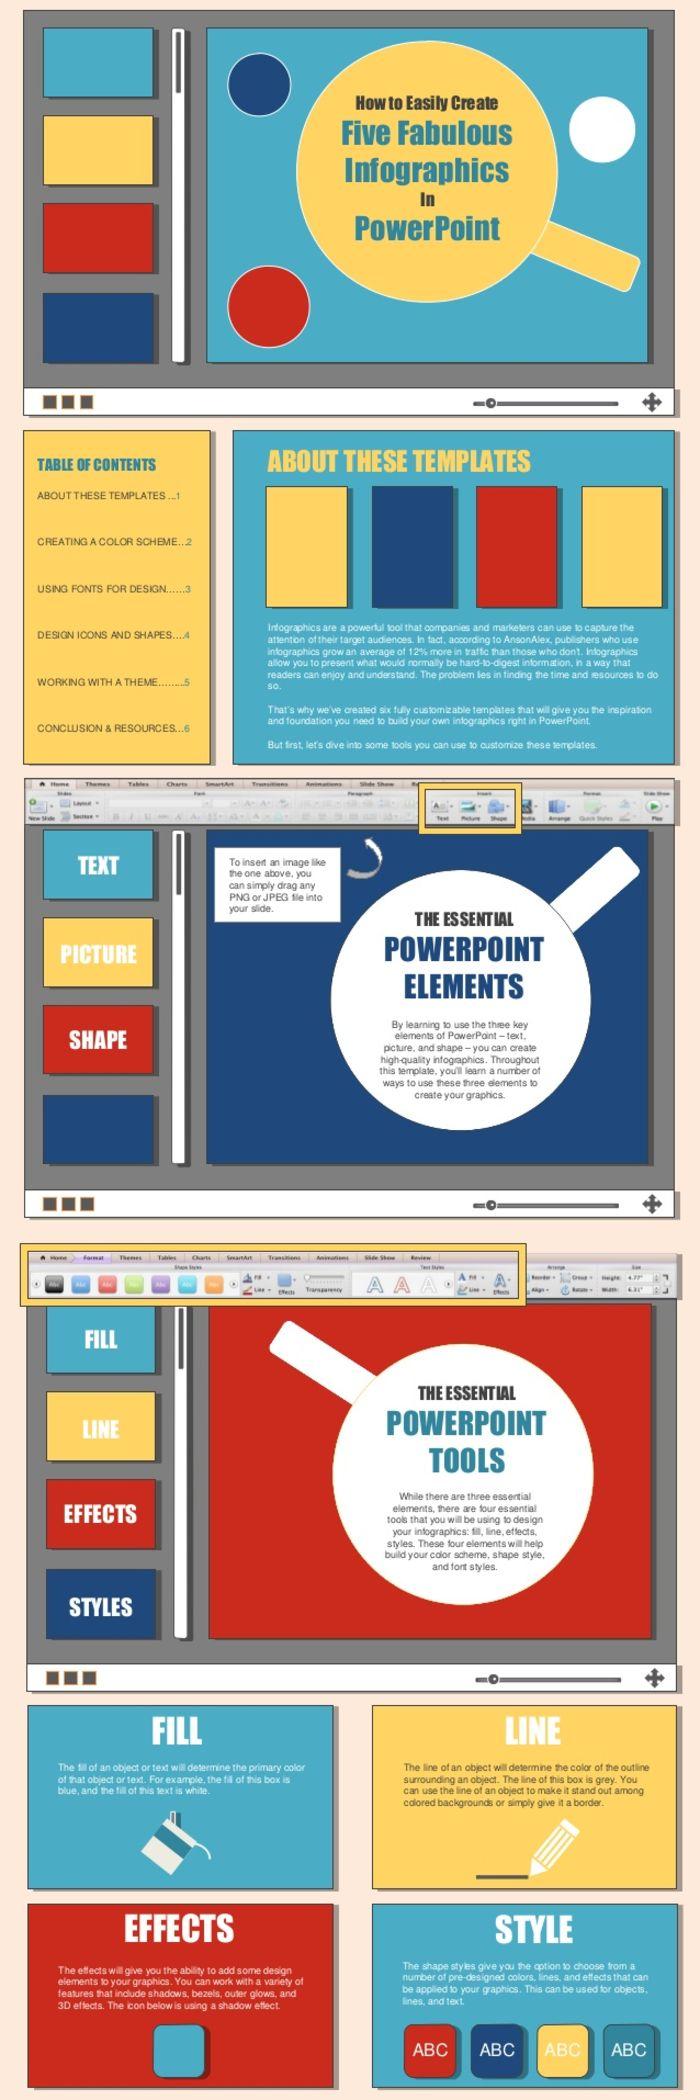 Infographics Creators and Tools | A Listly List